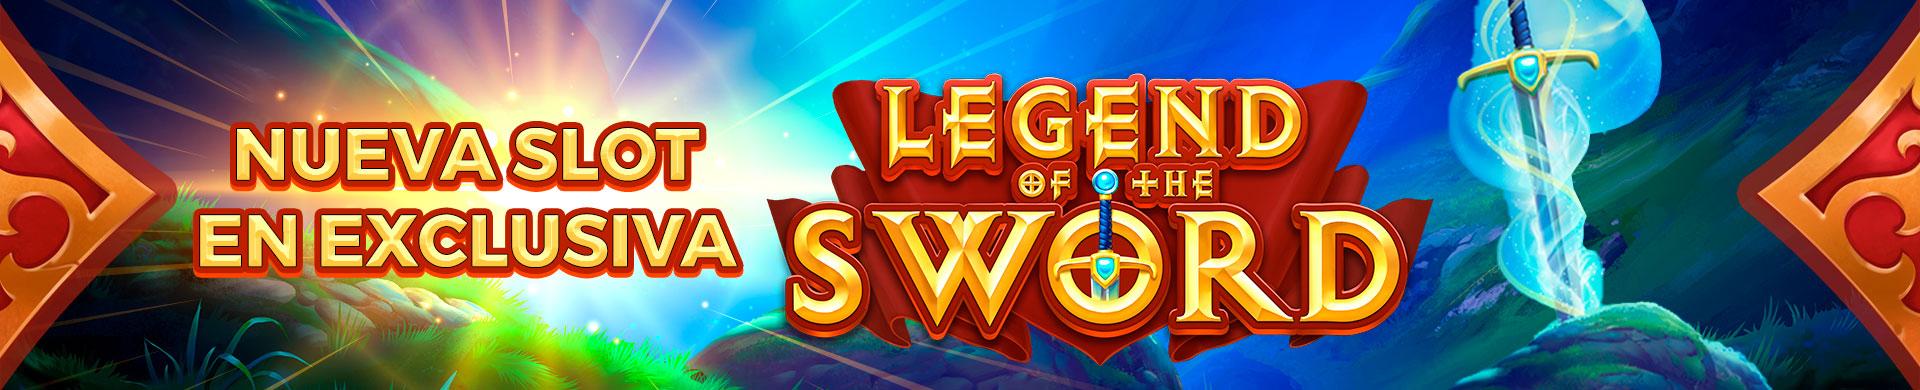 Slot Legend of The Sword